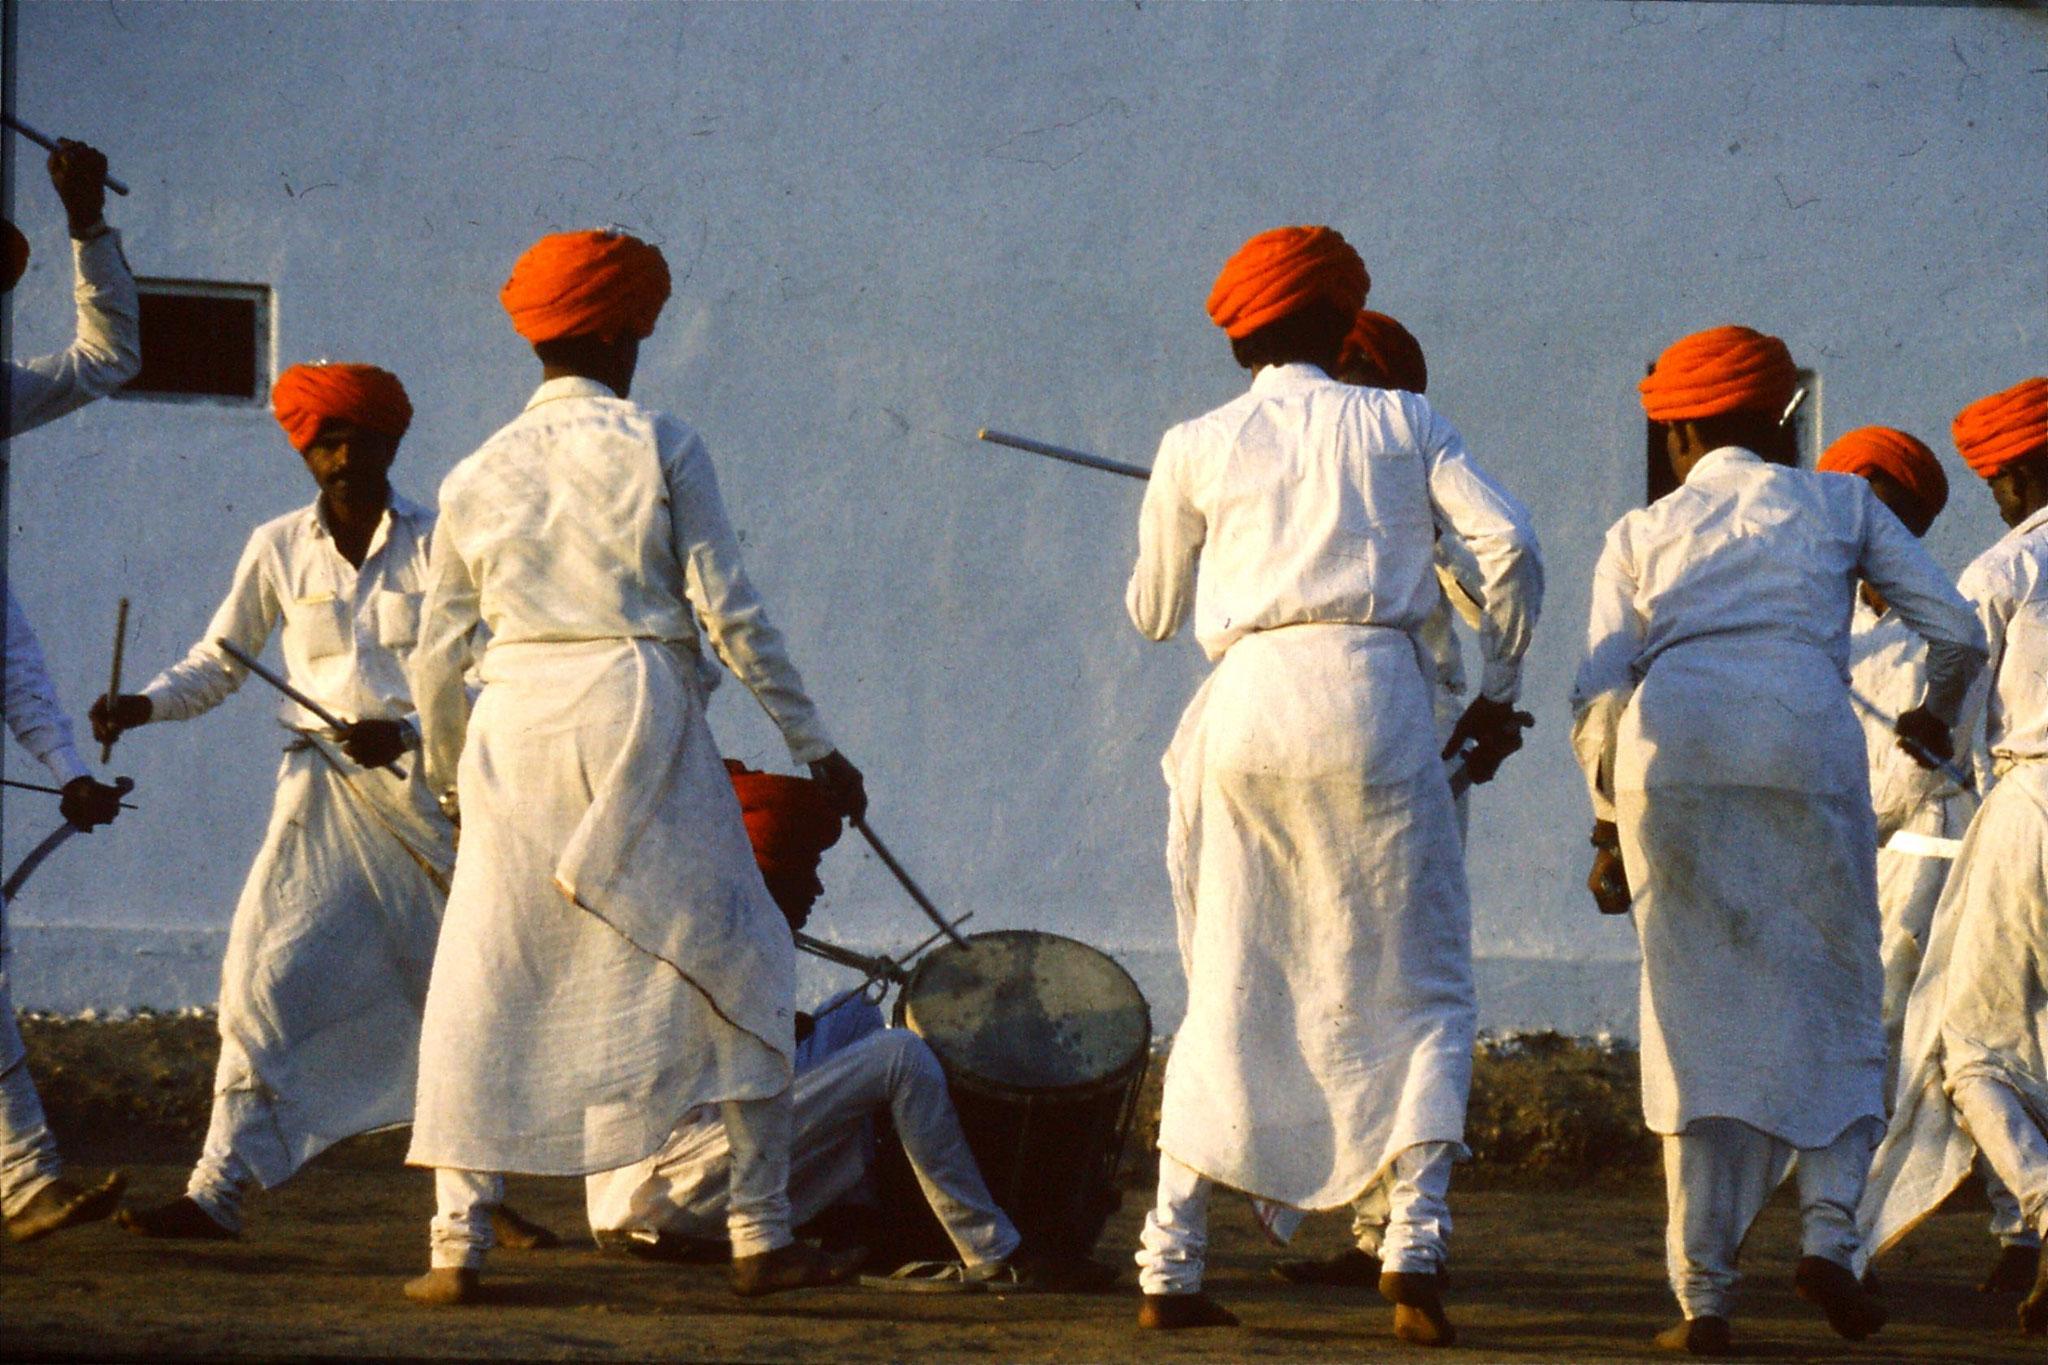 8/12/1989: 27: Udaipur Shilp Gram Craft Centre dancing